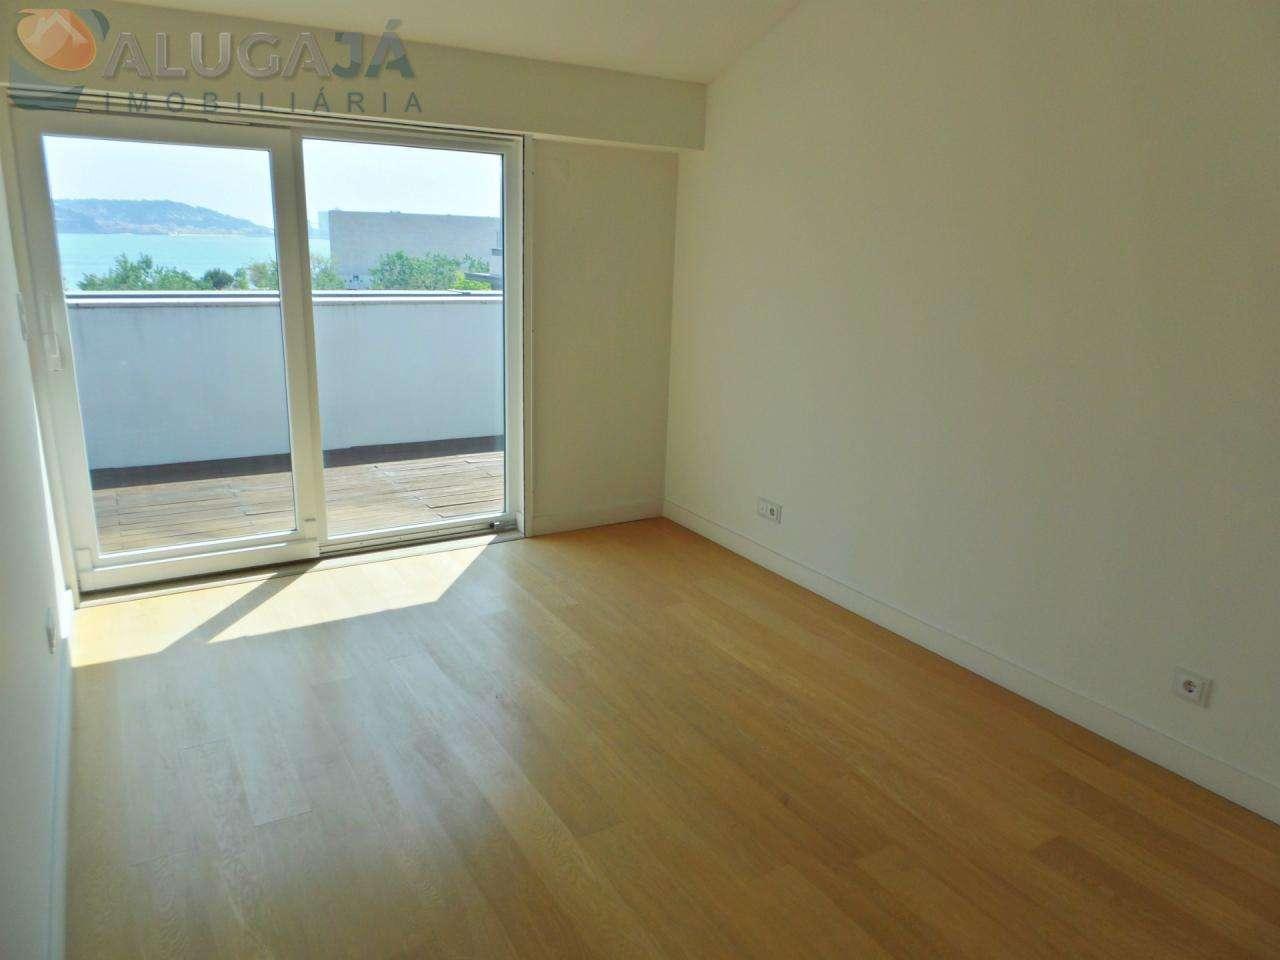 Apartamento para comprar, Belém, Lisboa - Foto 35